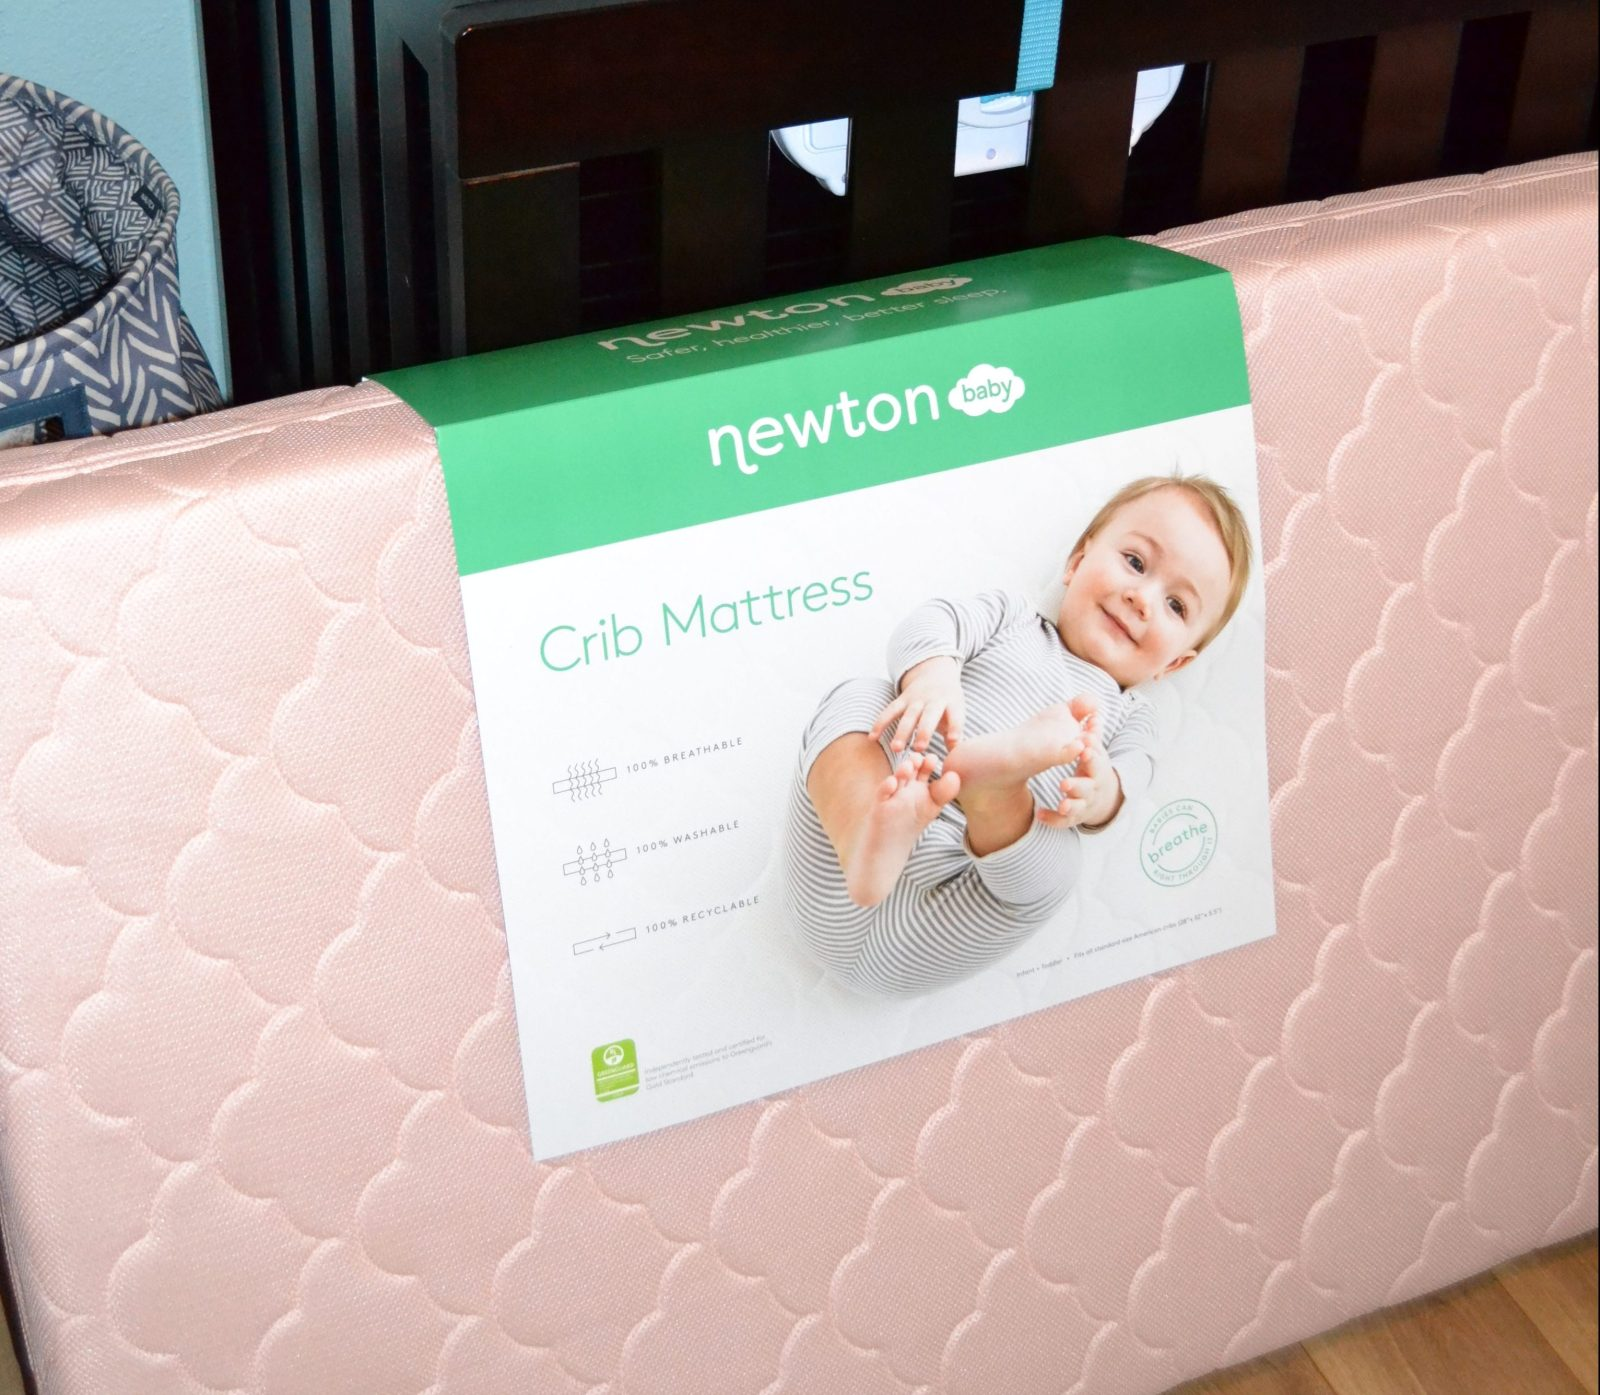 Choosing the best crib mattress for your baby with Newton Crib Mattress